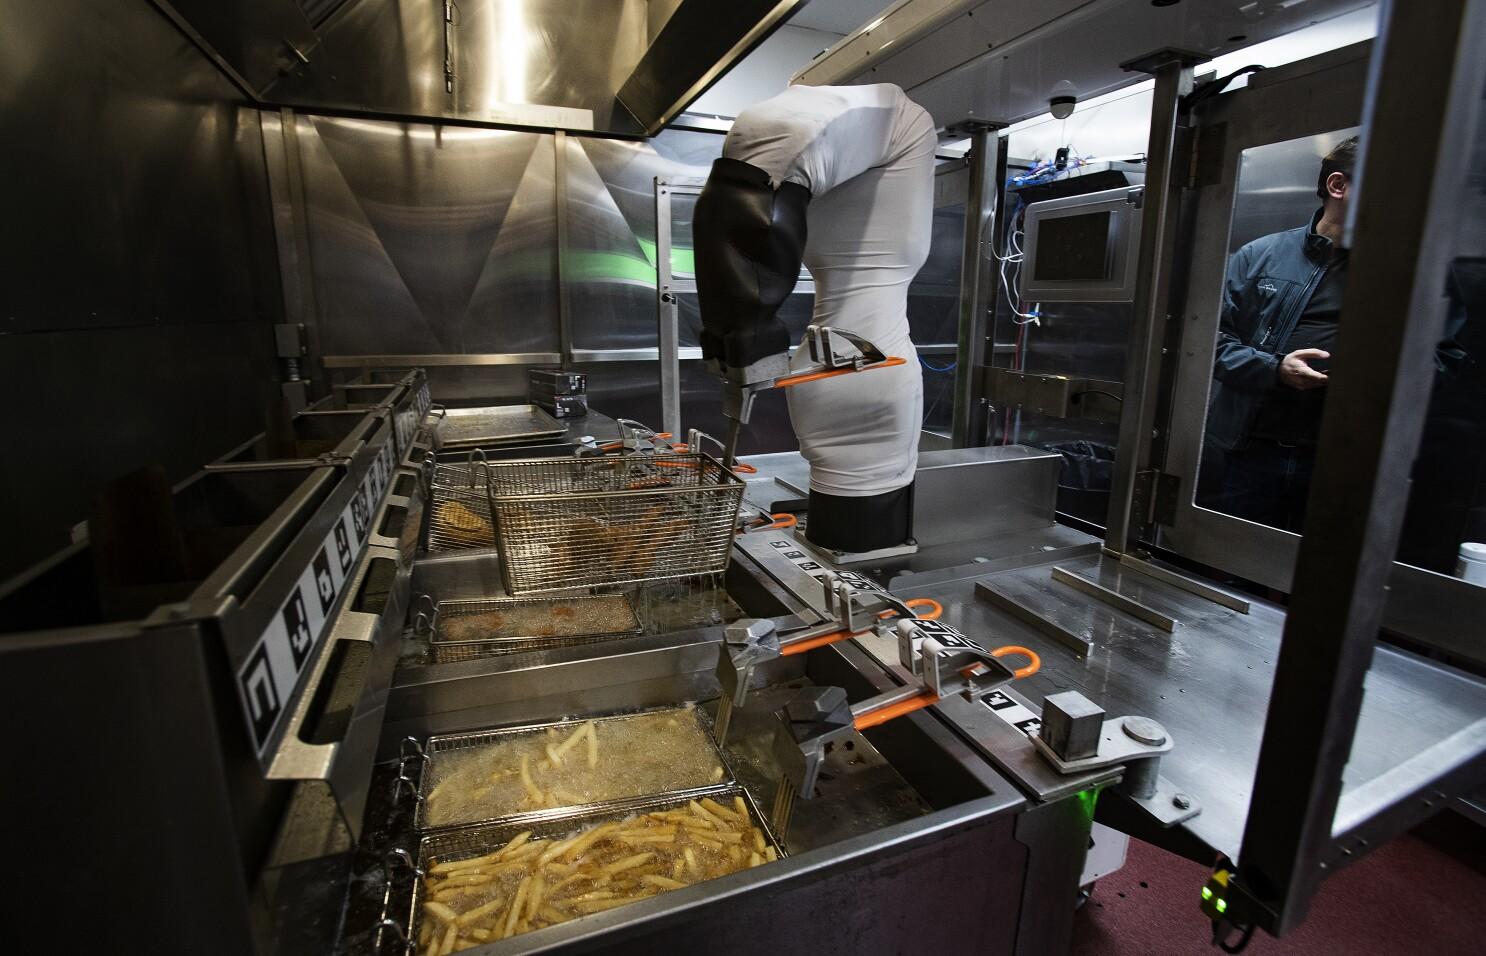 Miso Robotics - Flippy And The Robotic Future For Restaurants